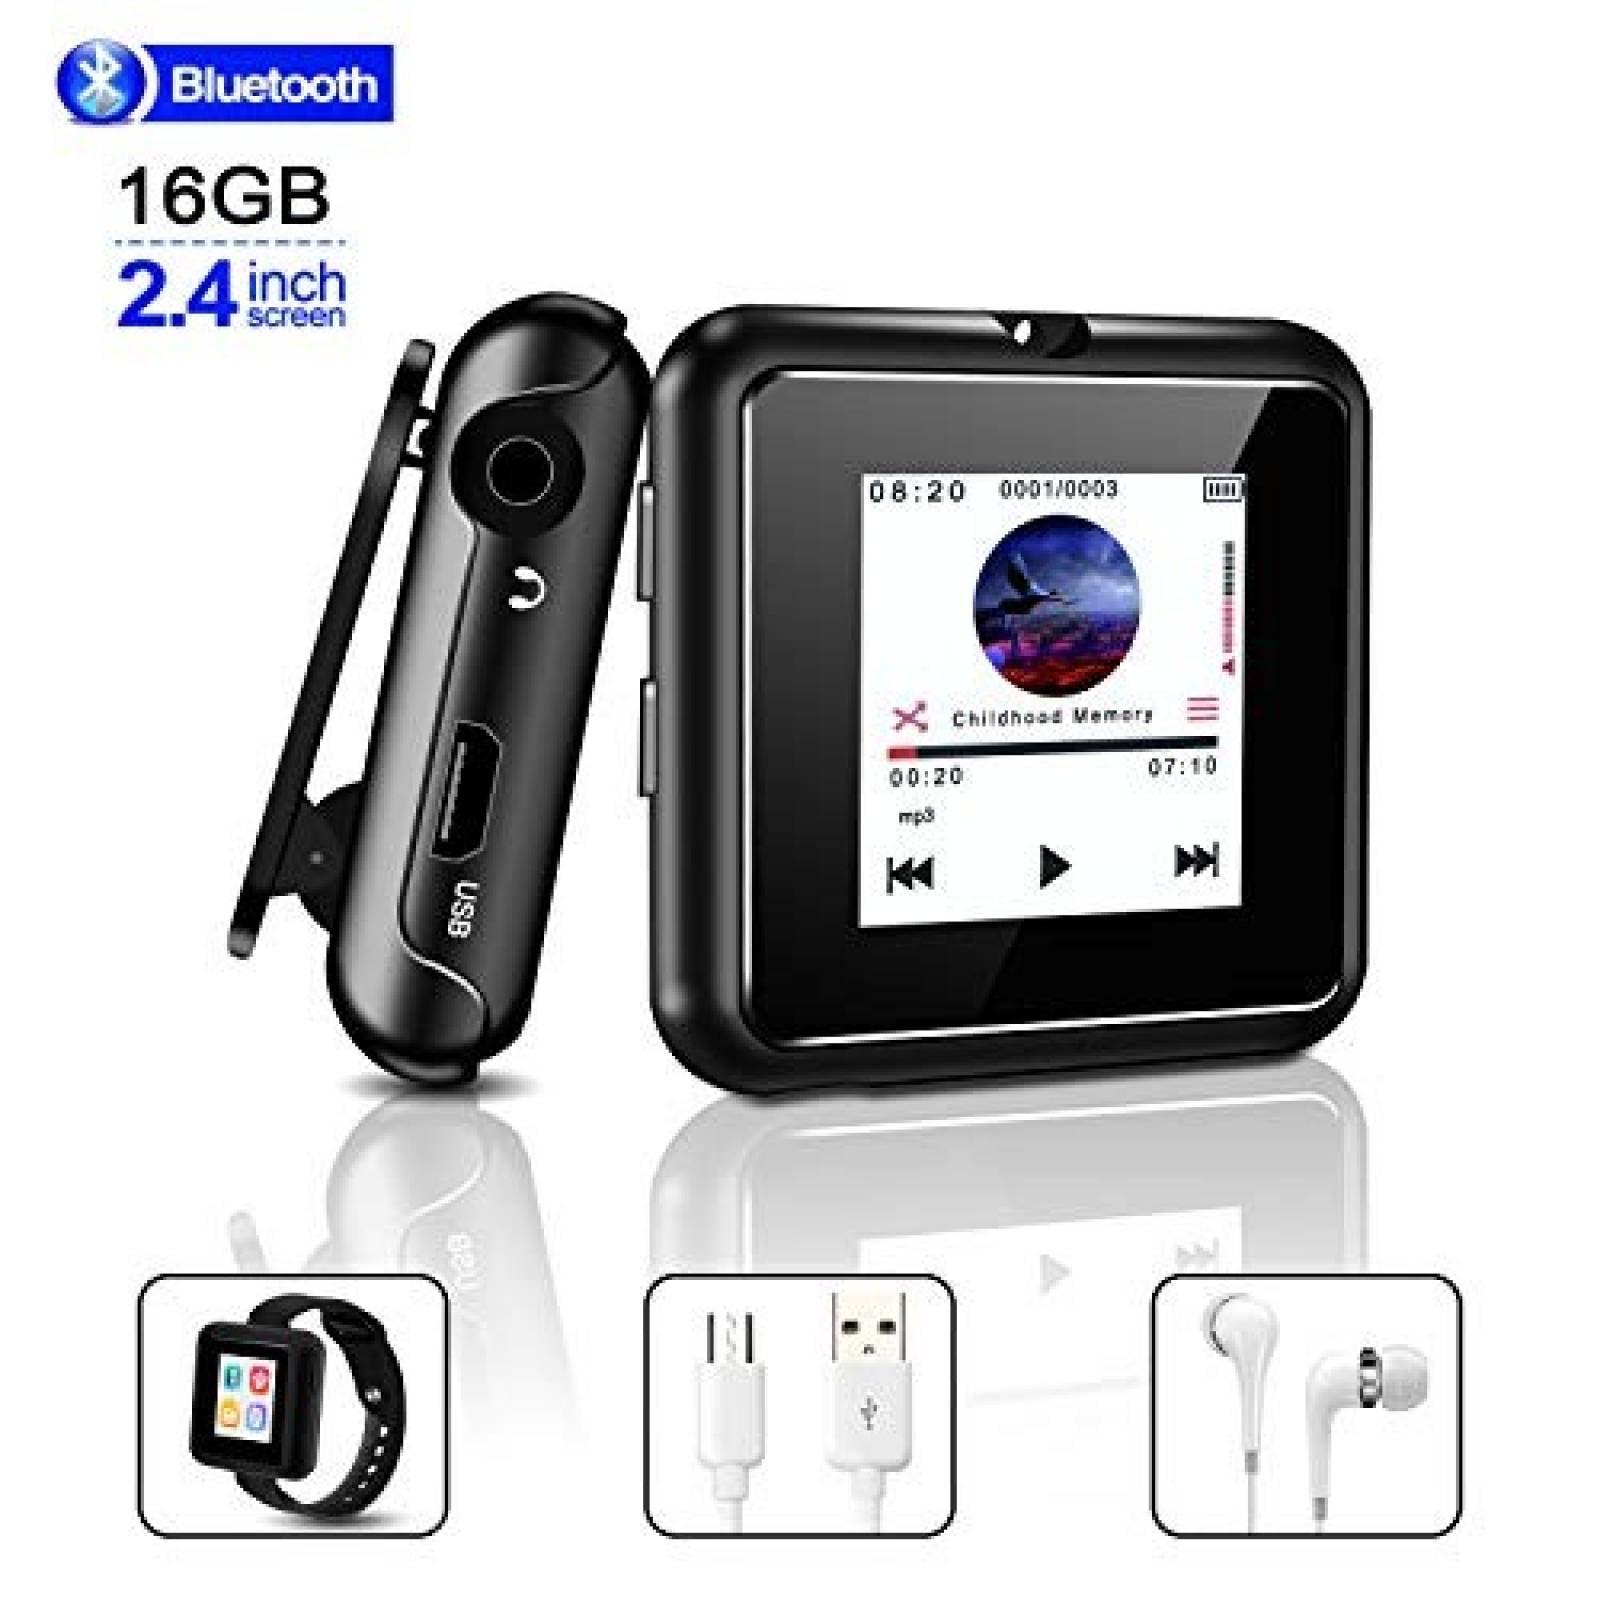 Reproductor MP3 HOCOMO 16GB Bluetooth 4.2 Pantalla Touch